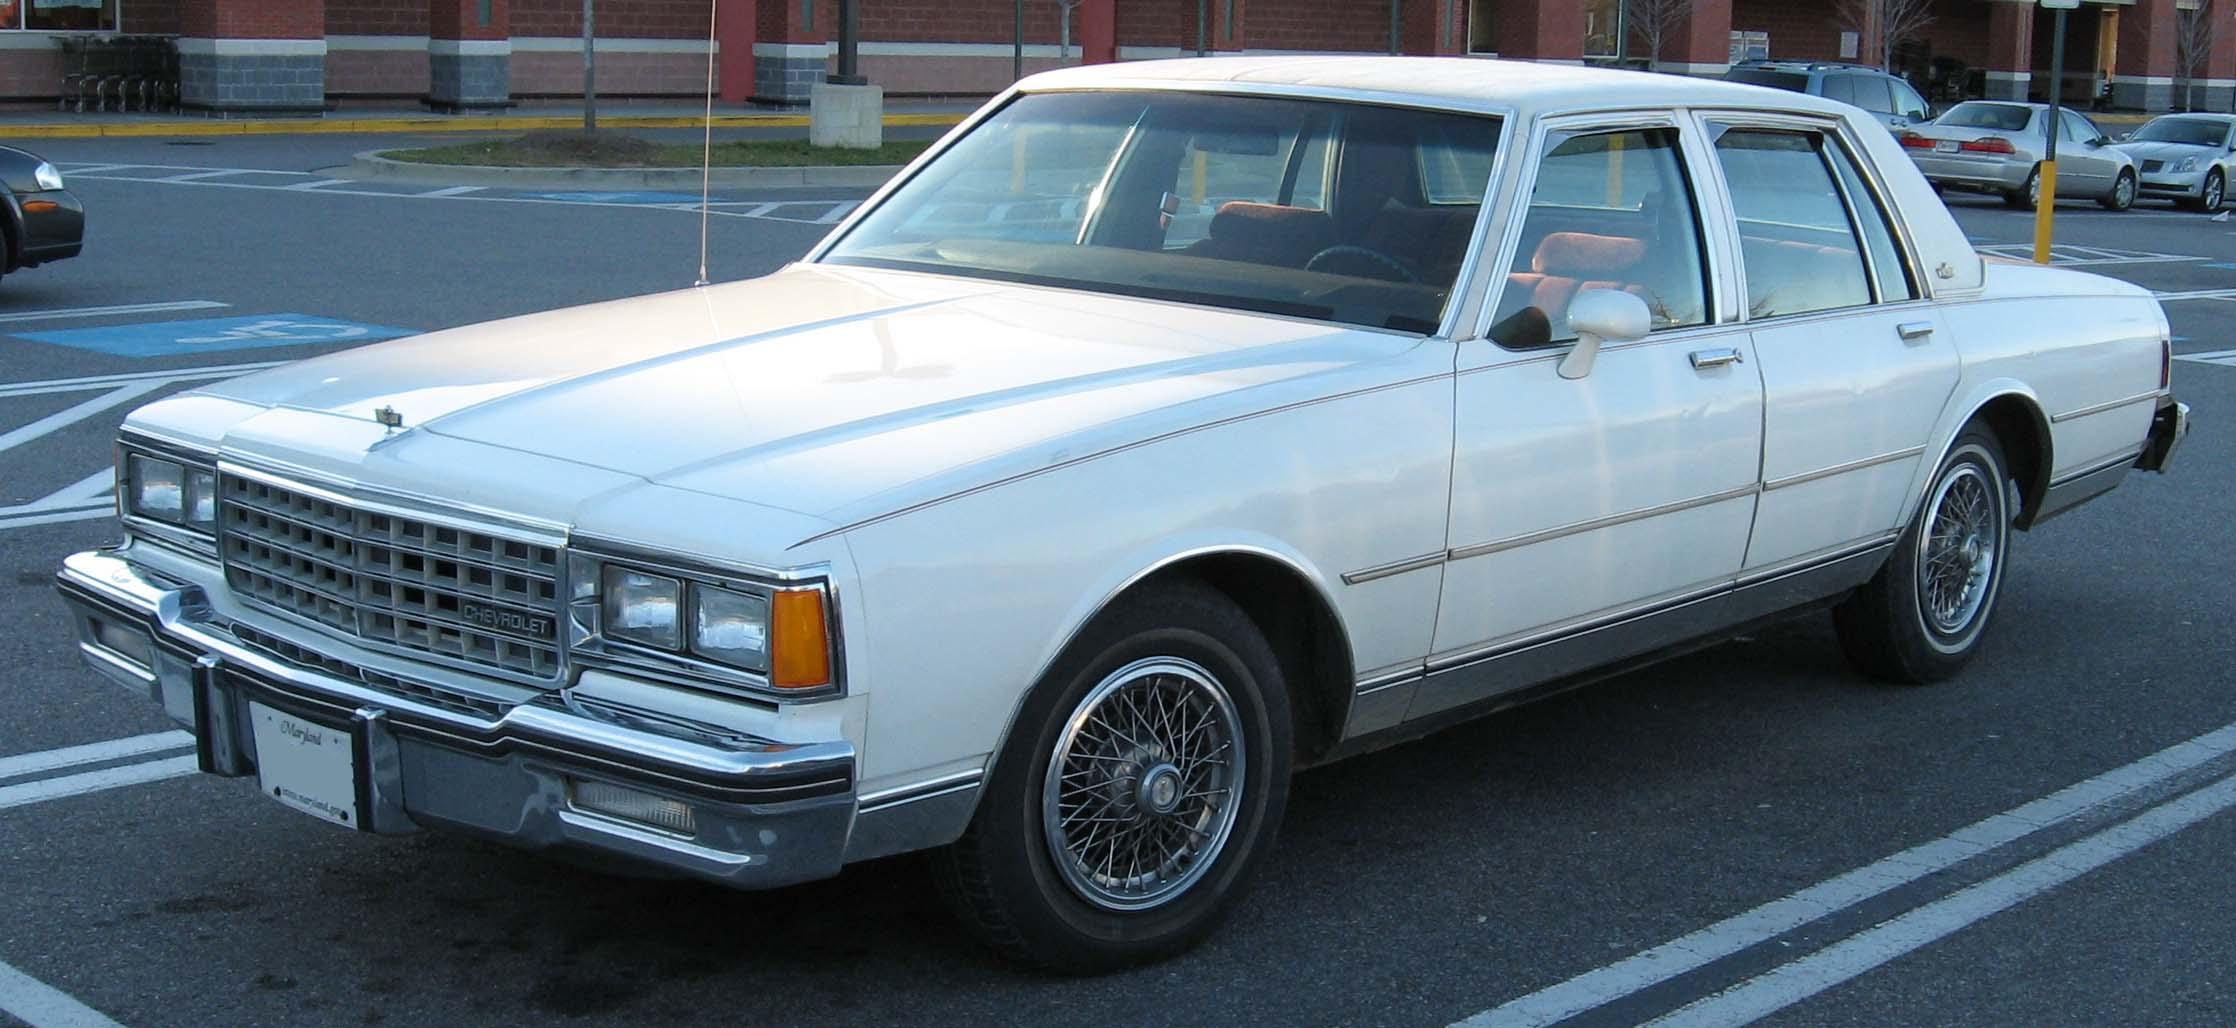 Chevrolet Caprice 1985 foto - 2